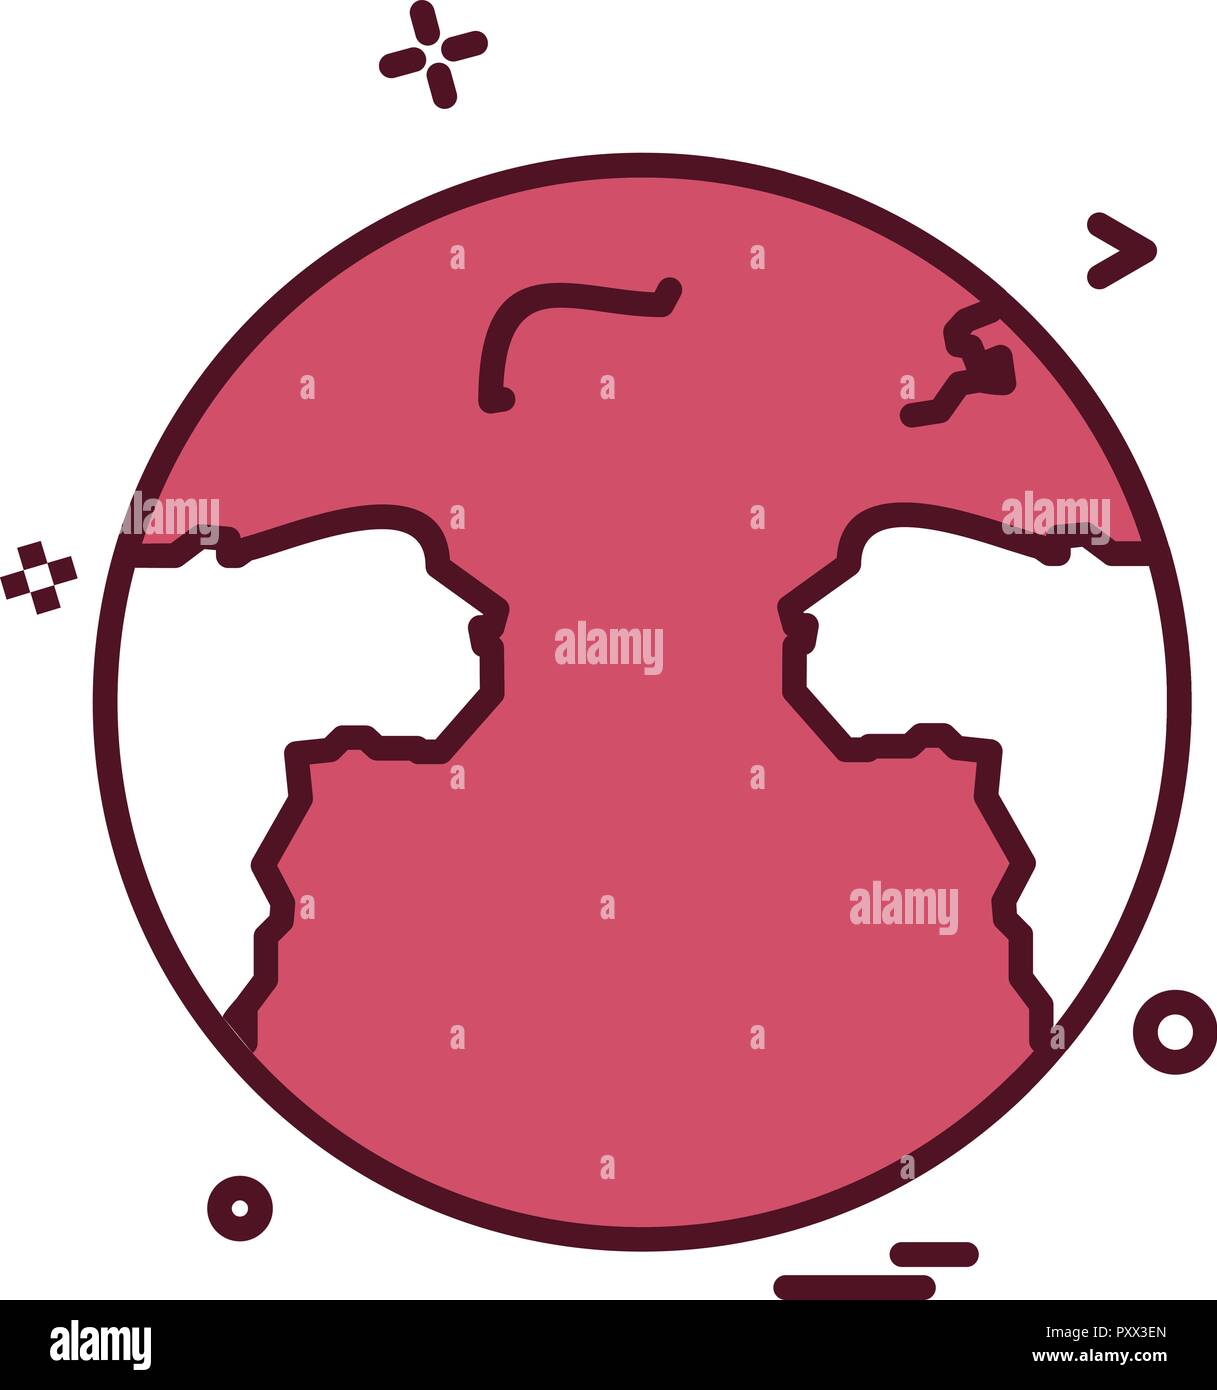 World map icon design vector Stock Vector Art & Illustration